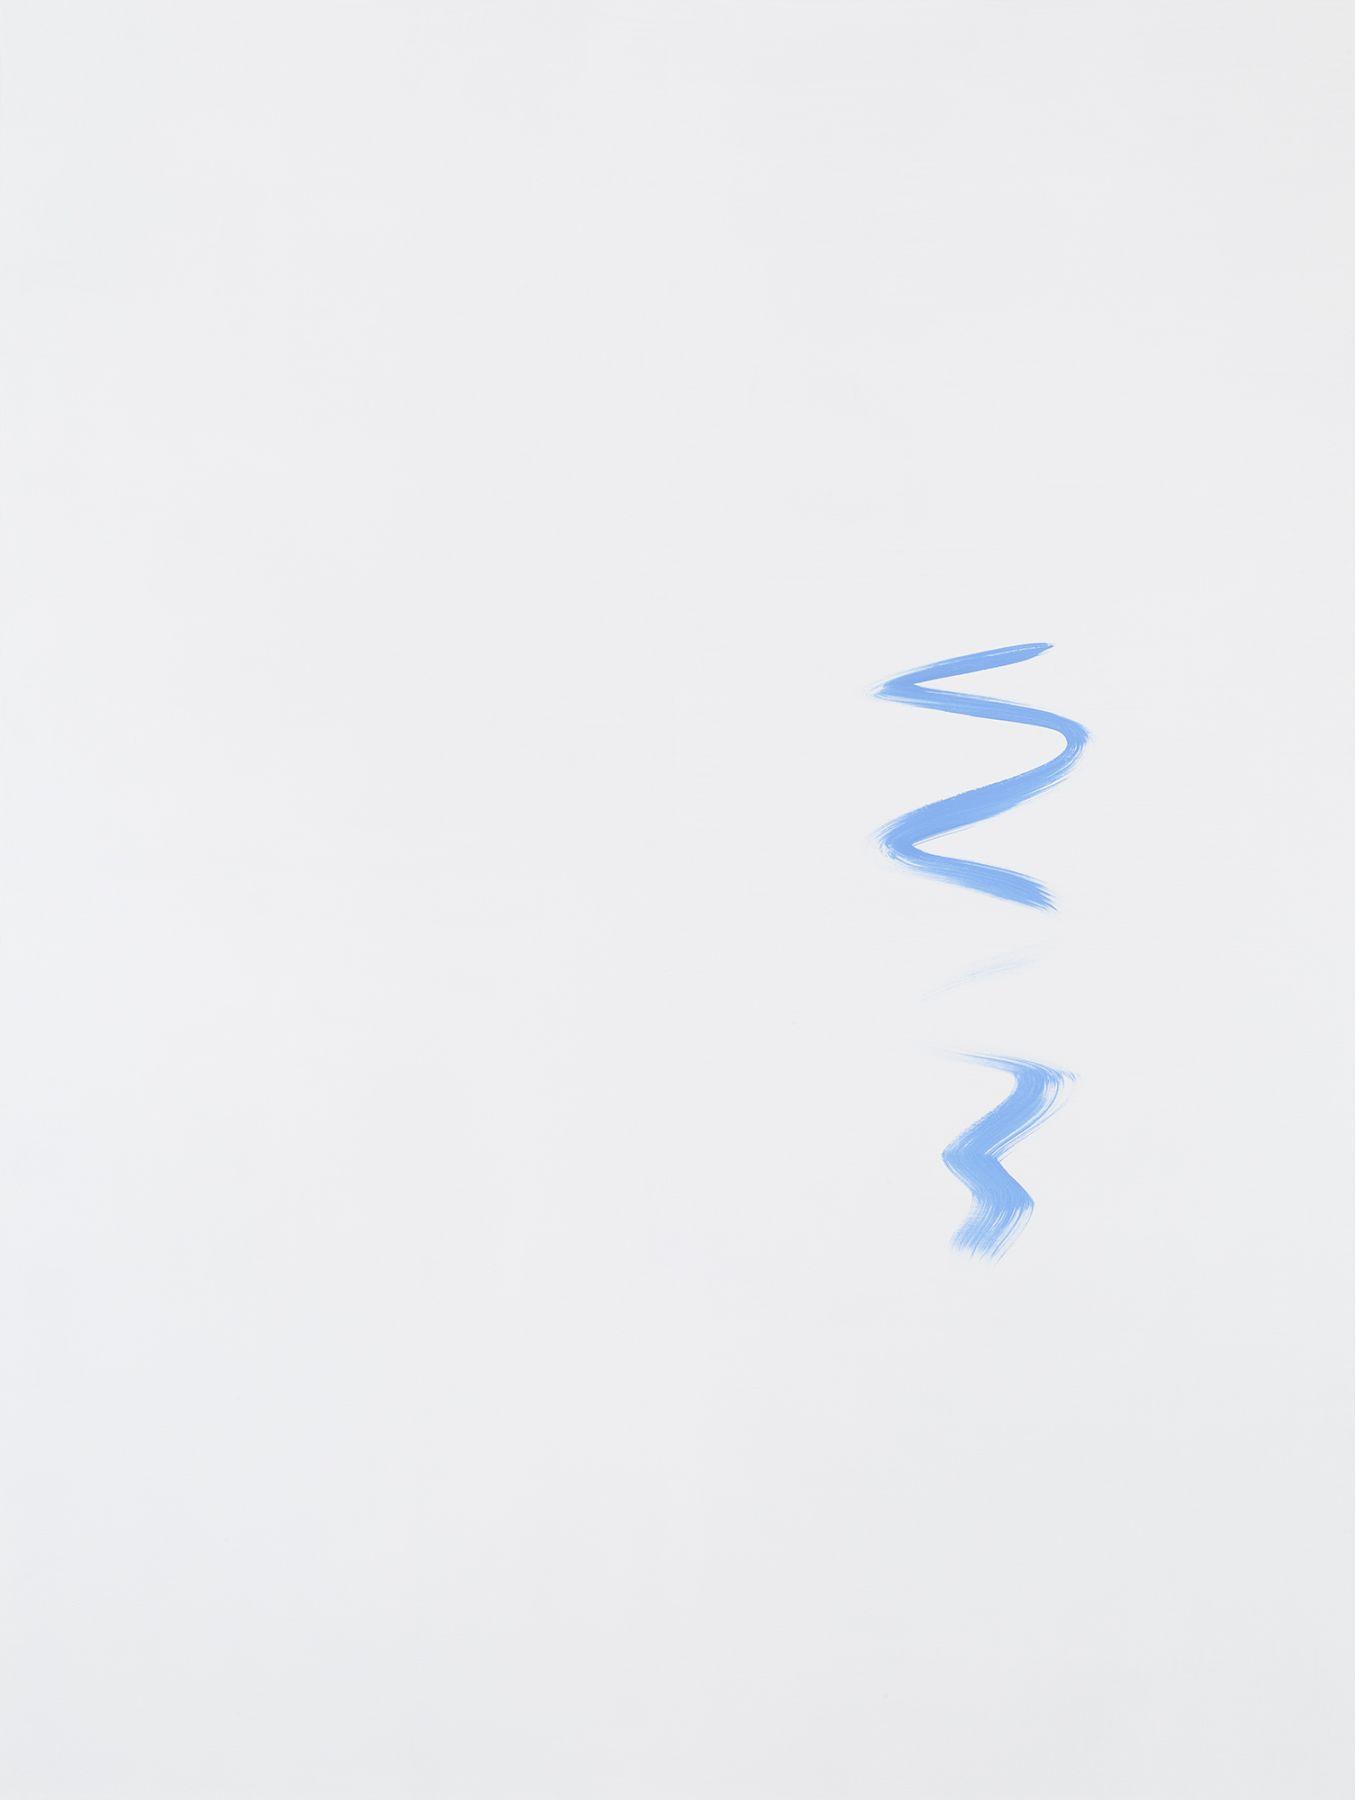 Michael Krebber MK.299, 2015 Acrylic on canvas 78 3/4 x 59 1/8 inches (200 x 150.2 cm)